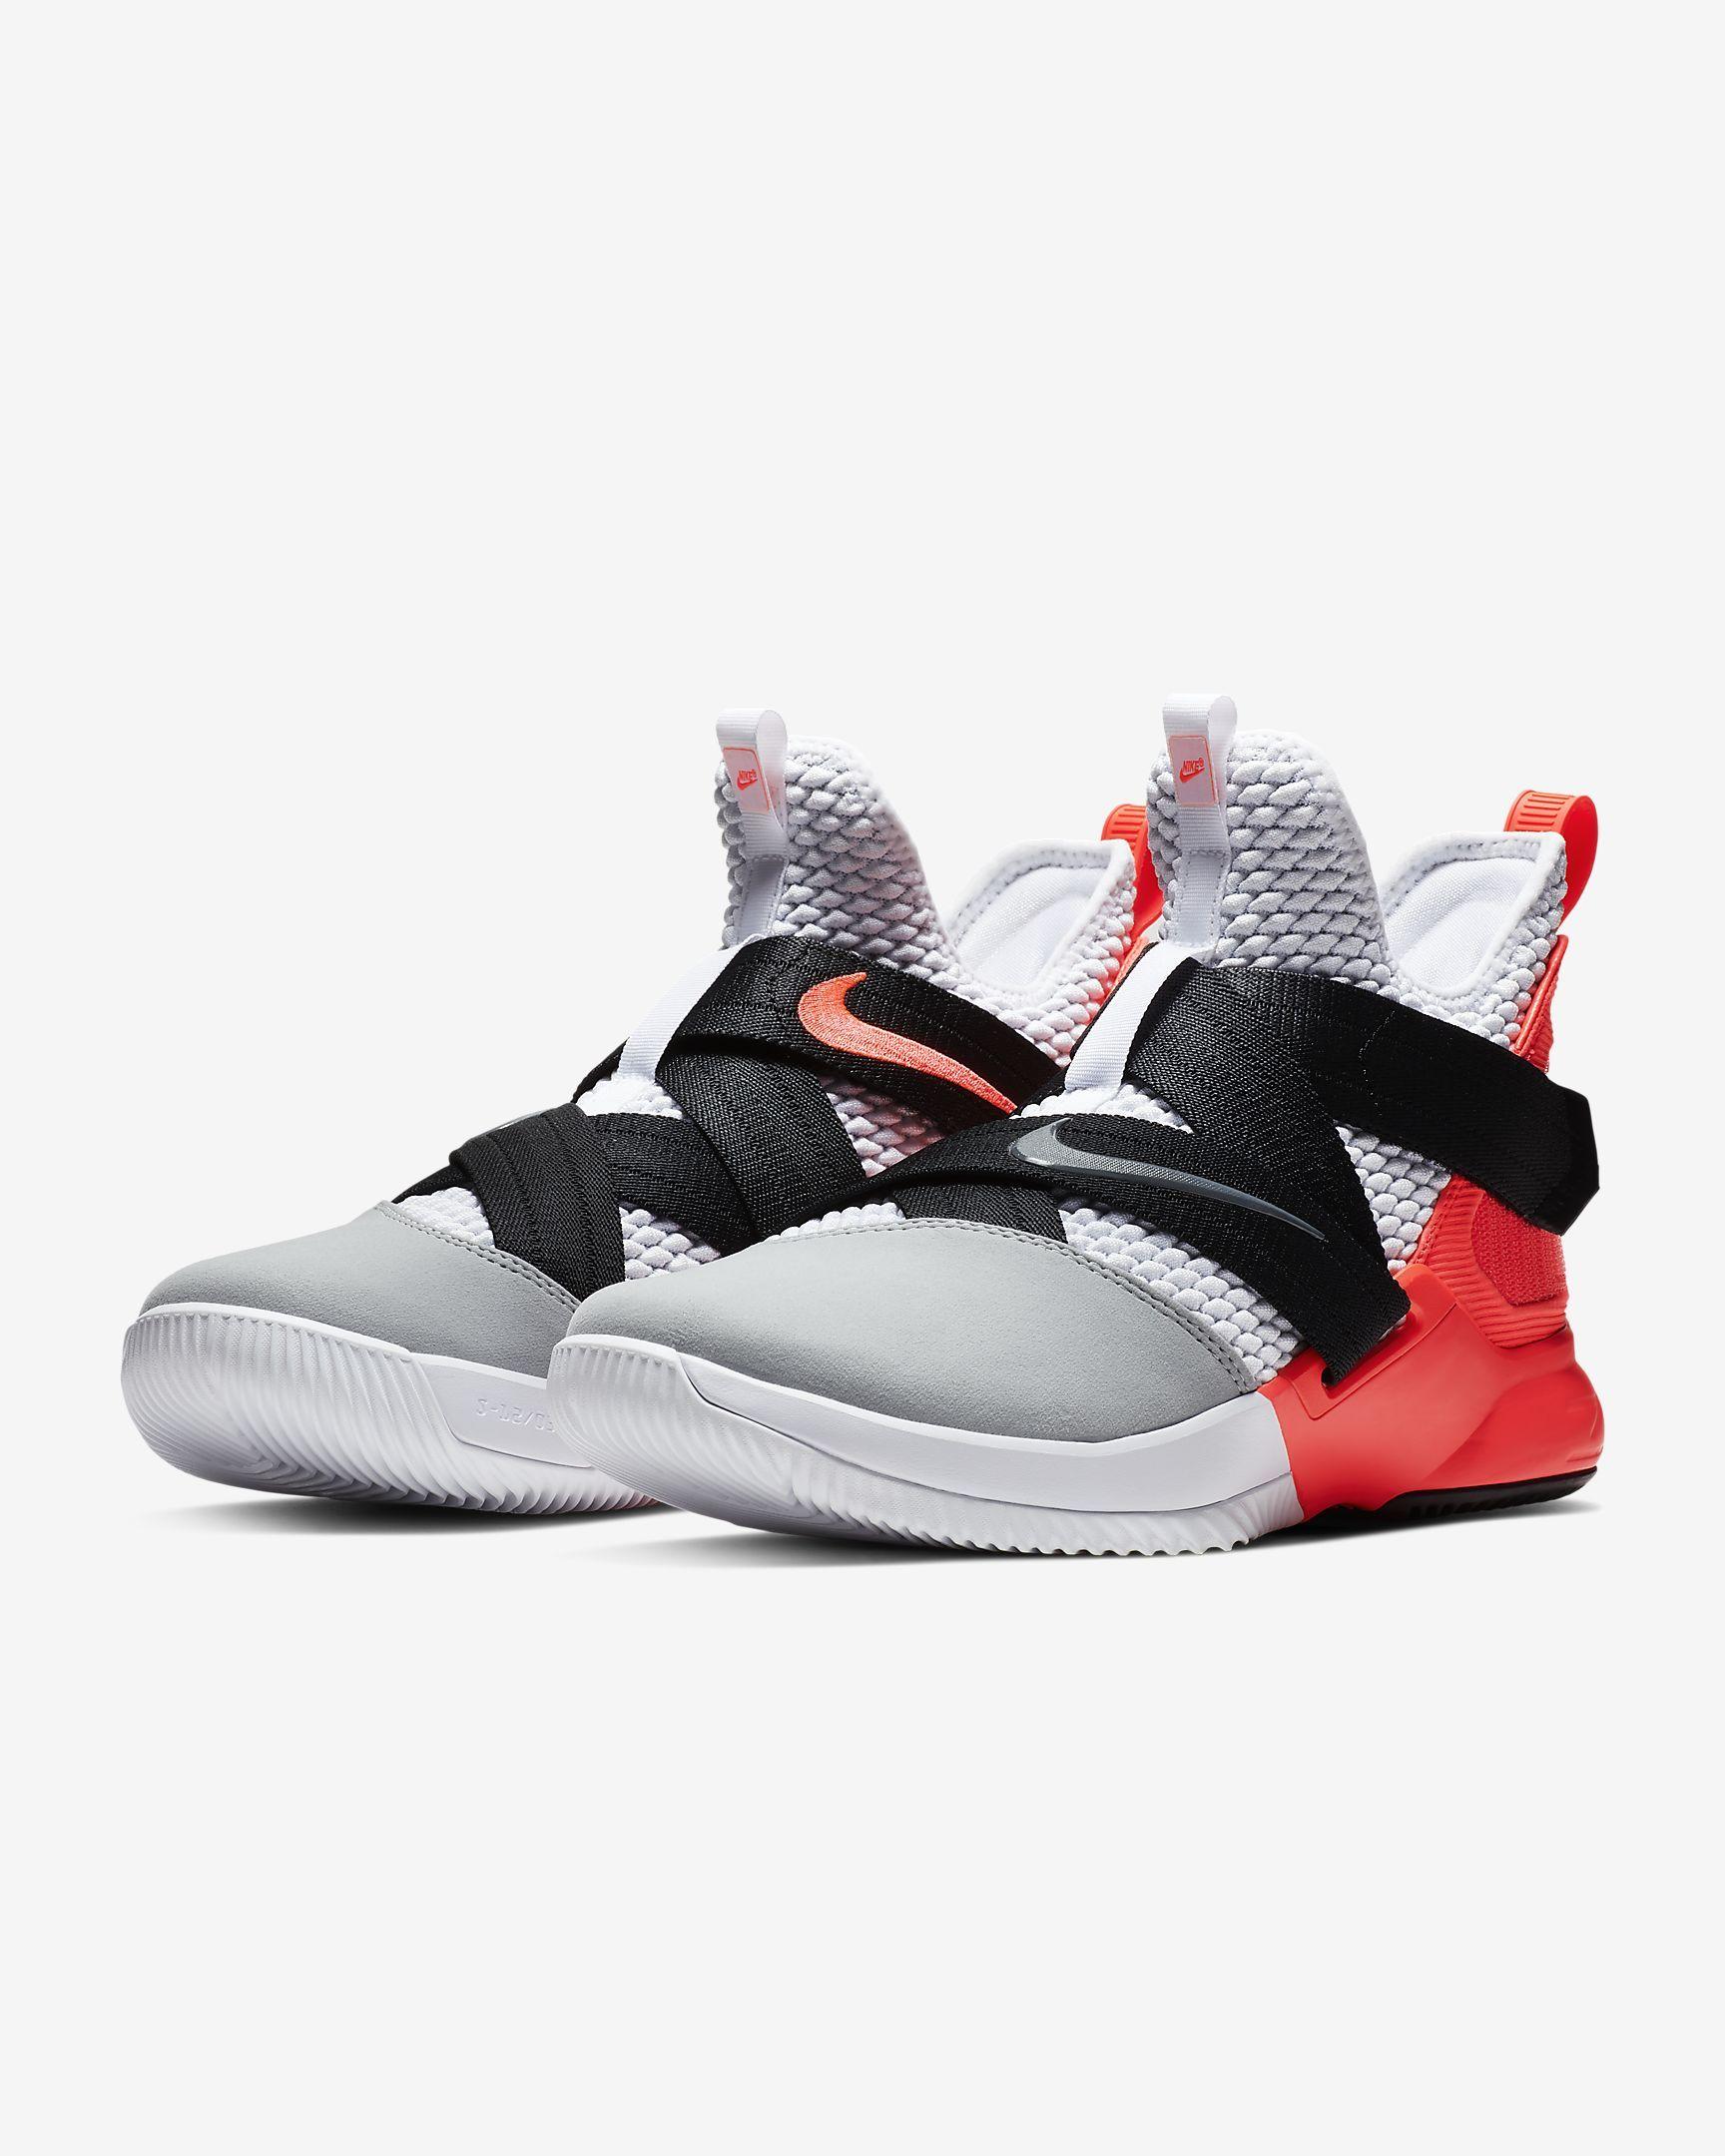 new concept 2efb5 aa763 Nike Men s Kobe Mamba Rage Premium Basketball Shoes